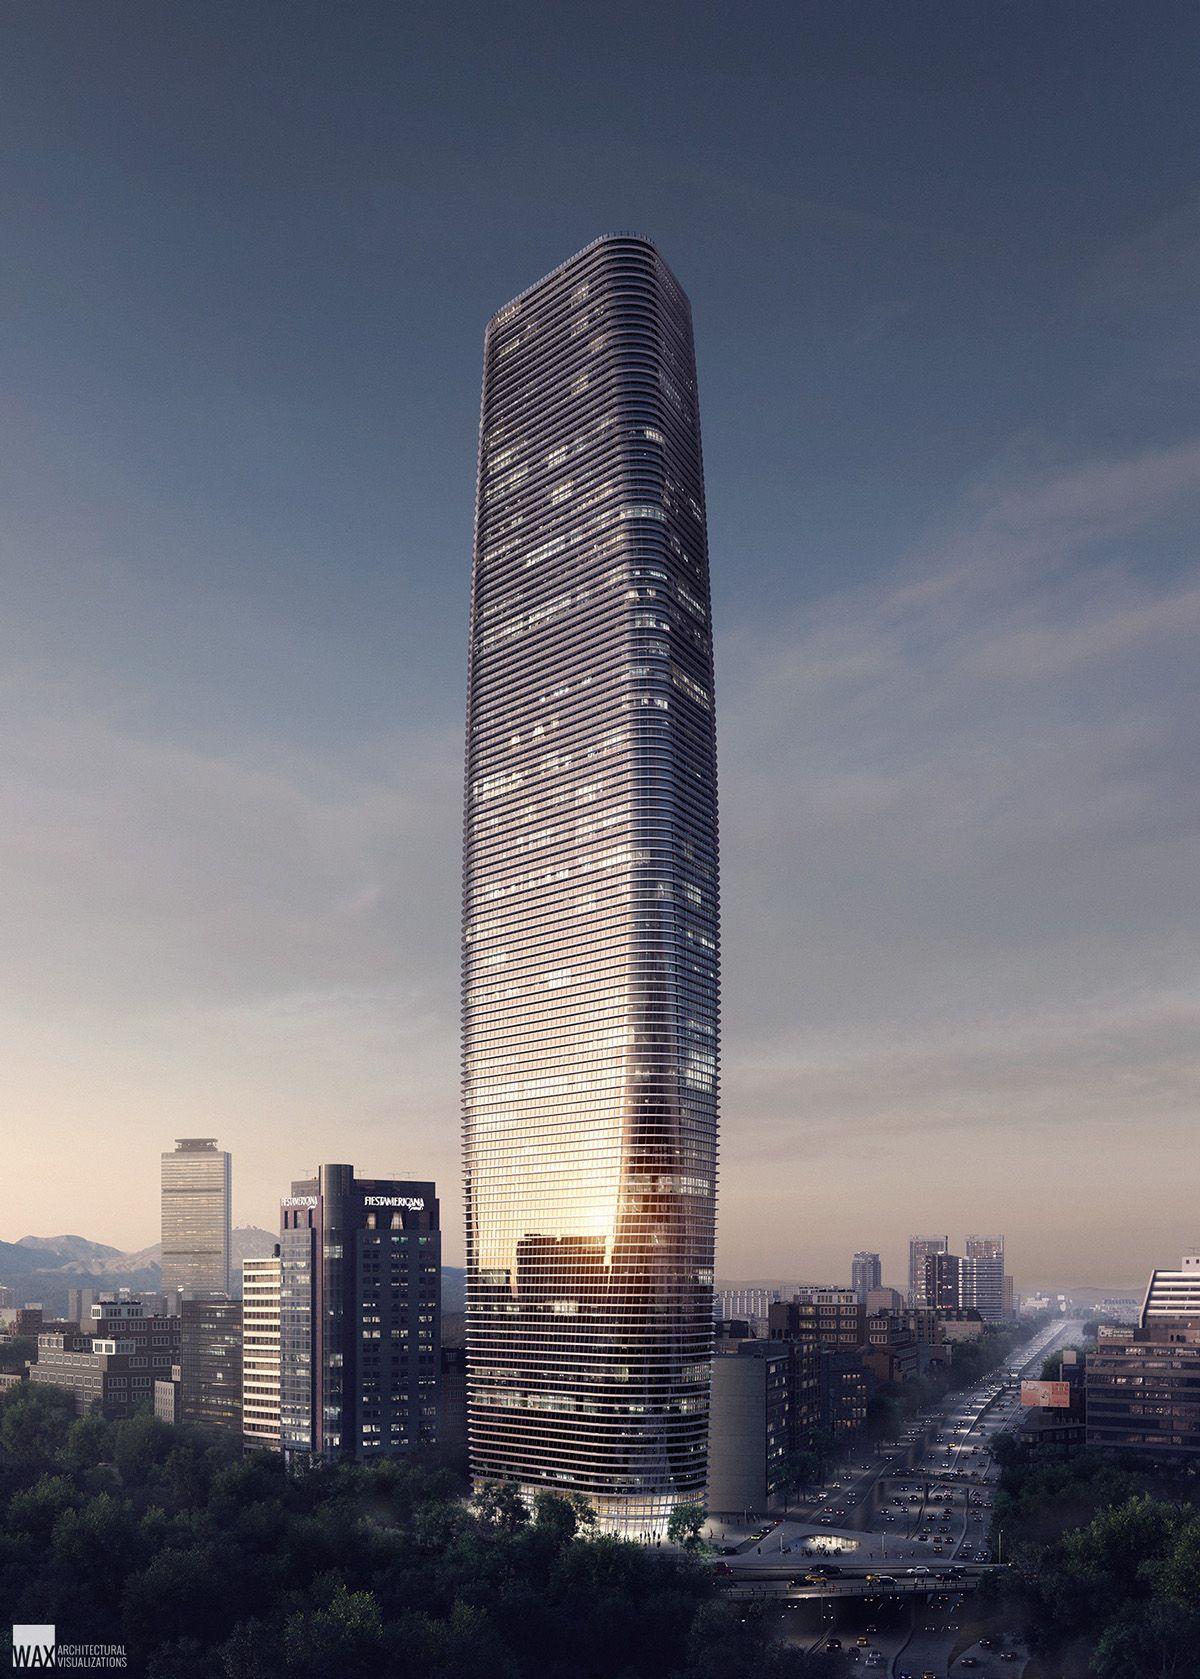 Reforma Tower on Behance